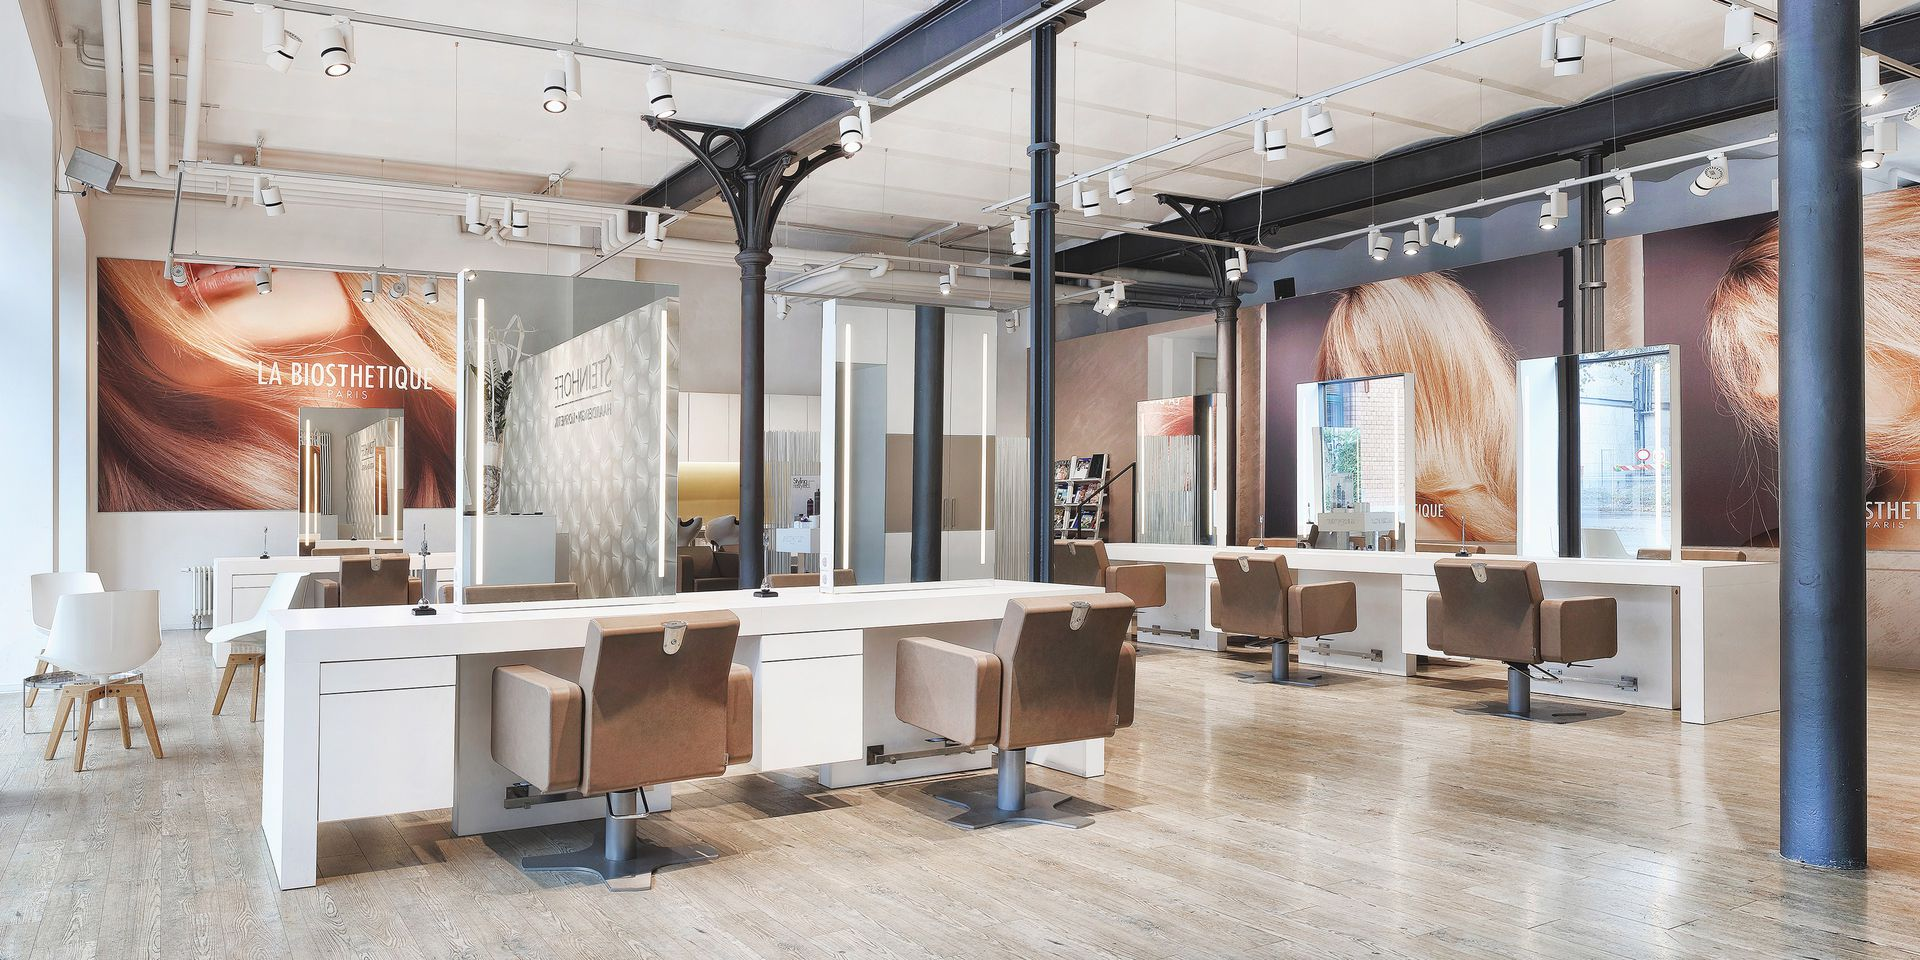 Das Friseur-Erlebnis in Reutlingen : Steinhoff Haardesign - La ...